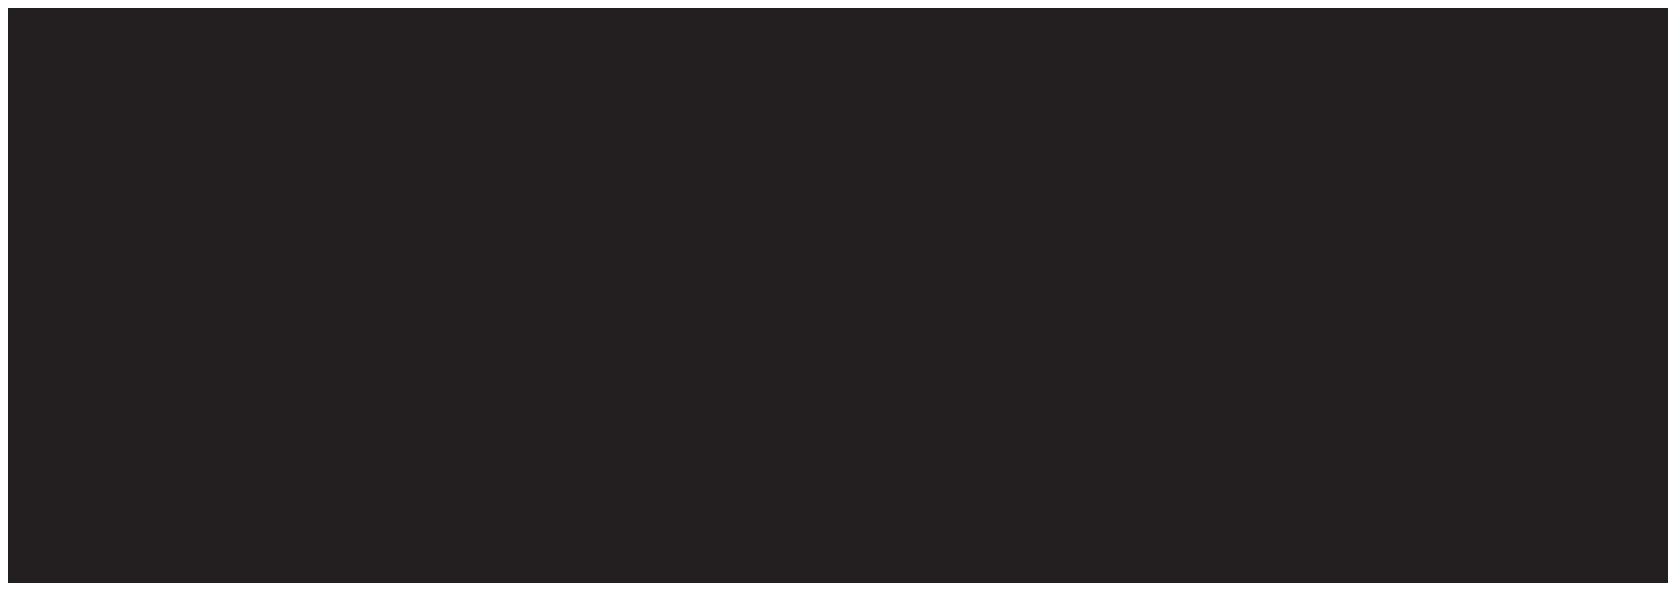 IIA---Logotipo---Horizontal.png